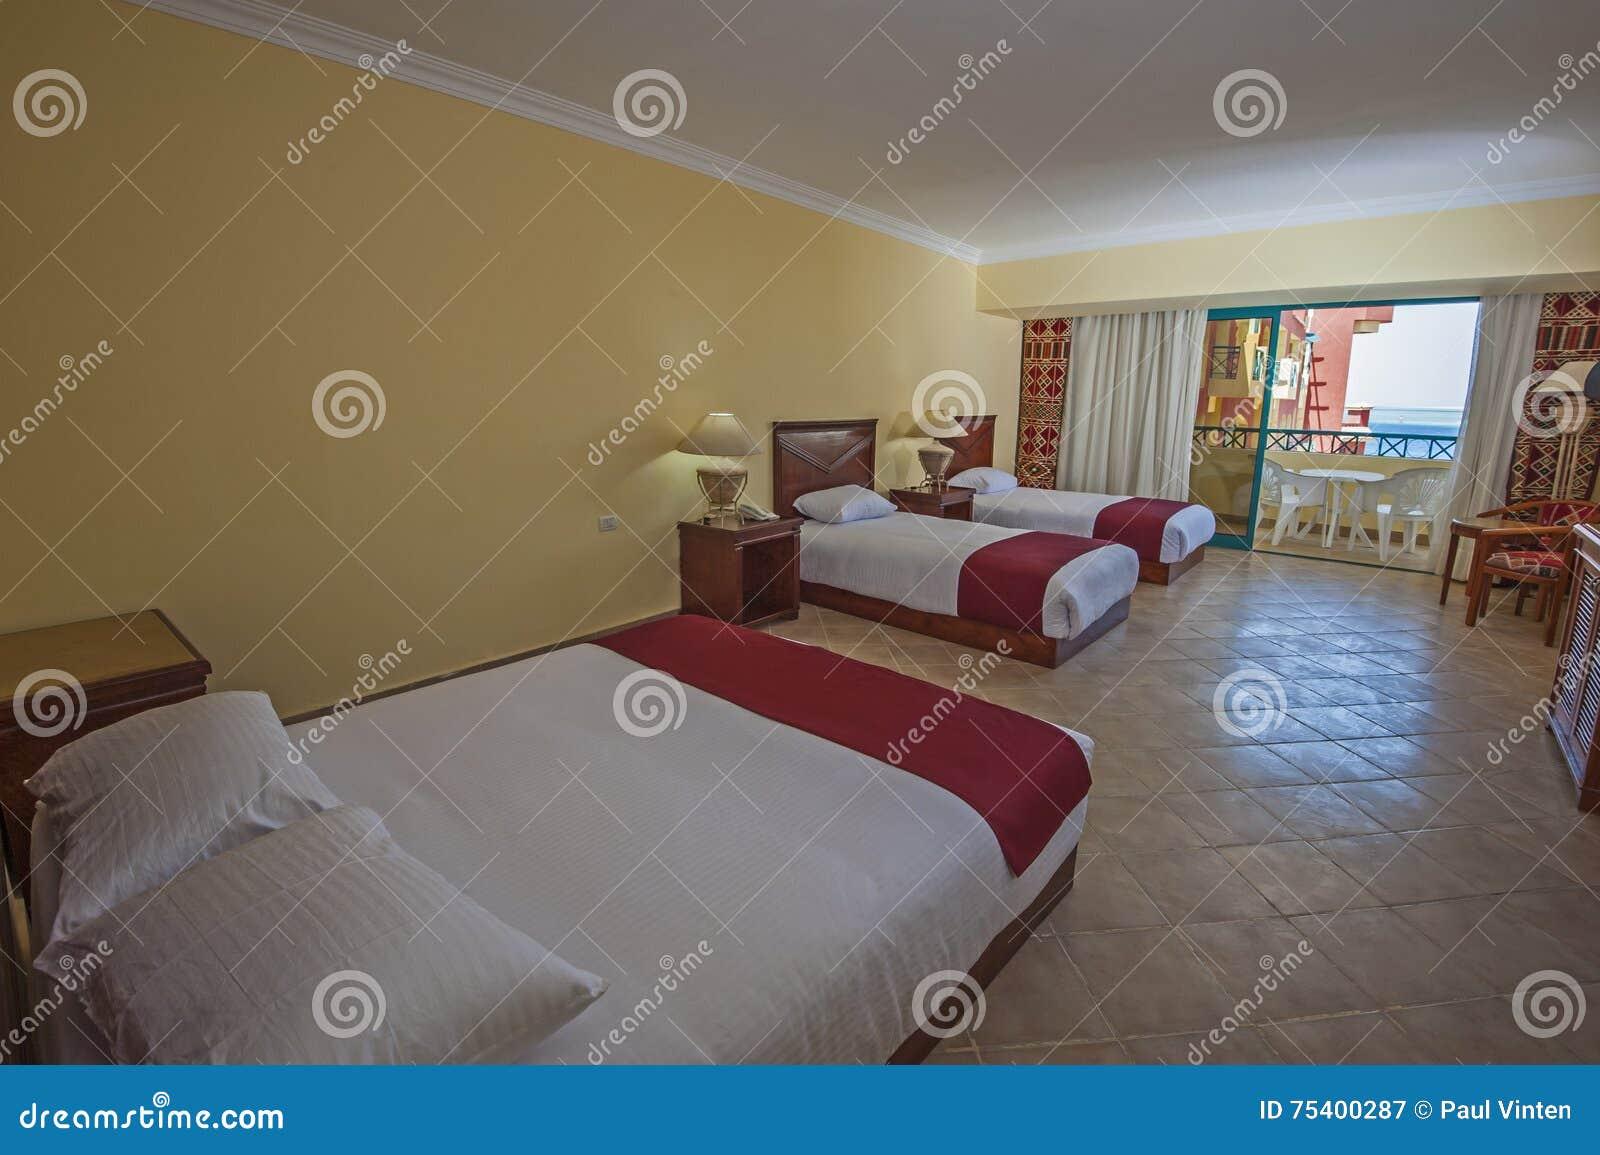 Hotel Di Lusso Interni : Beverly hills hotel bungalow california architettonica di interni